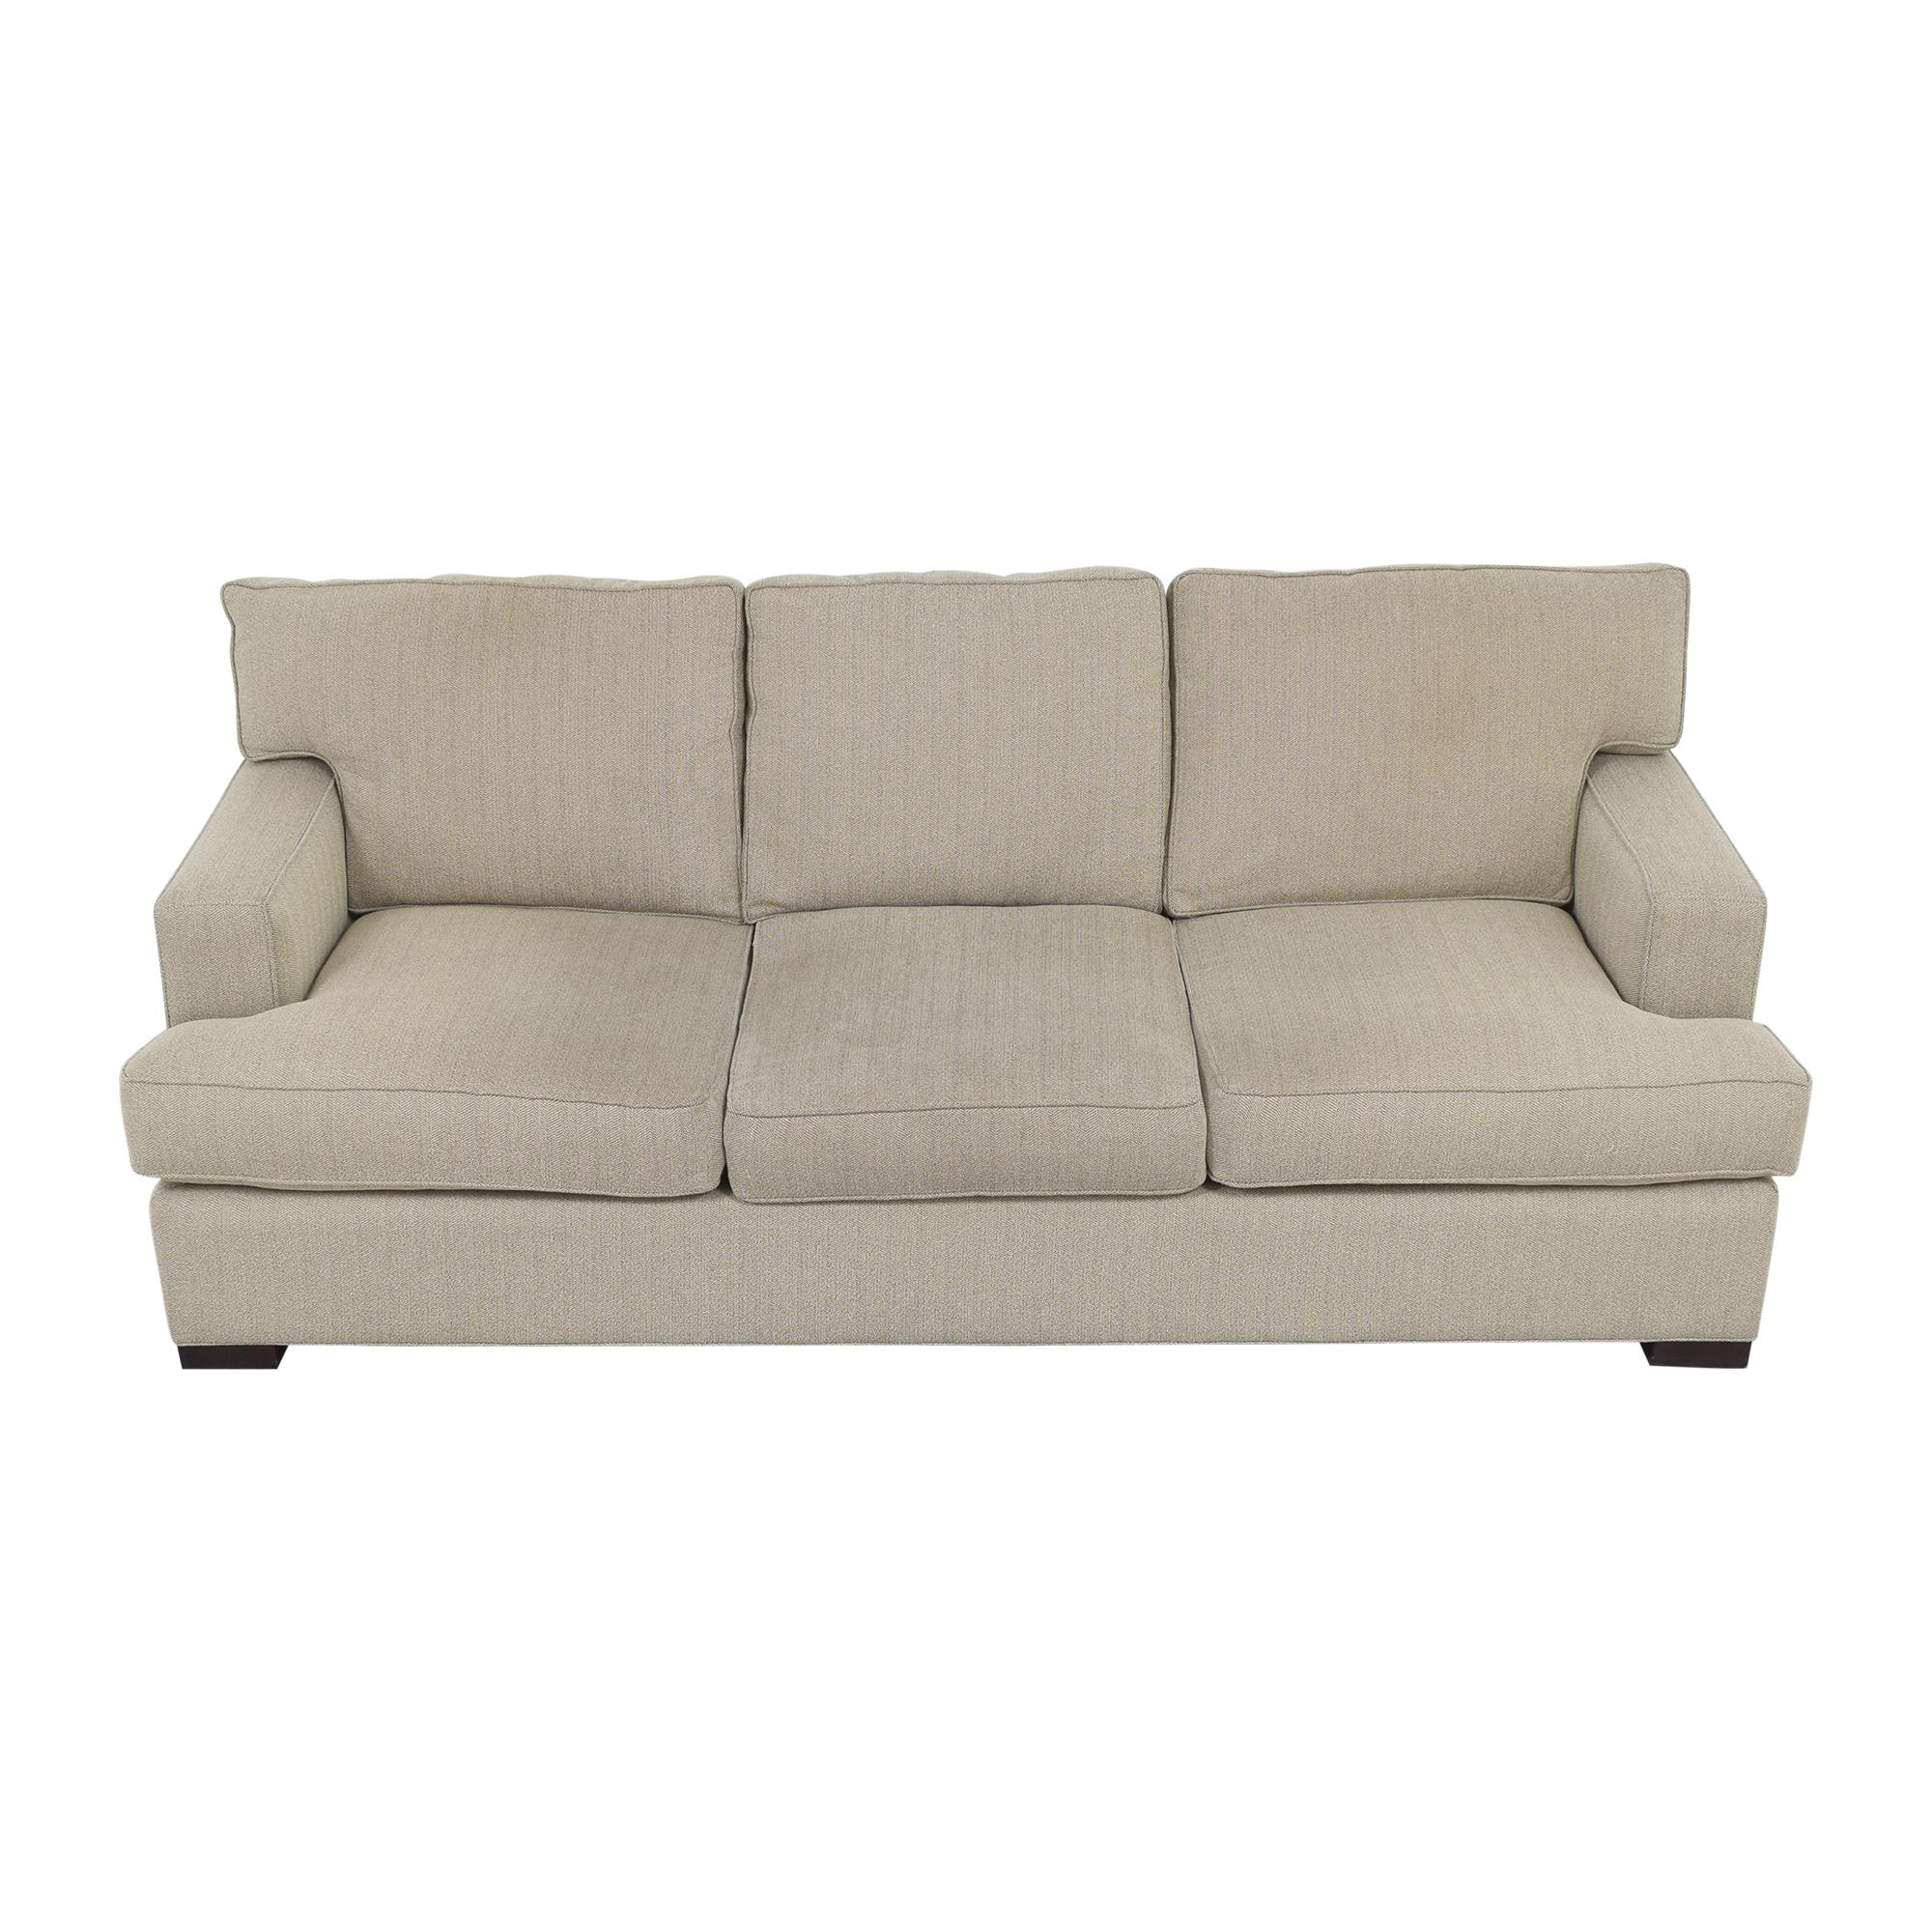 Arhaus Dune Three Cushion Sofa / Sofas